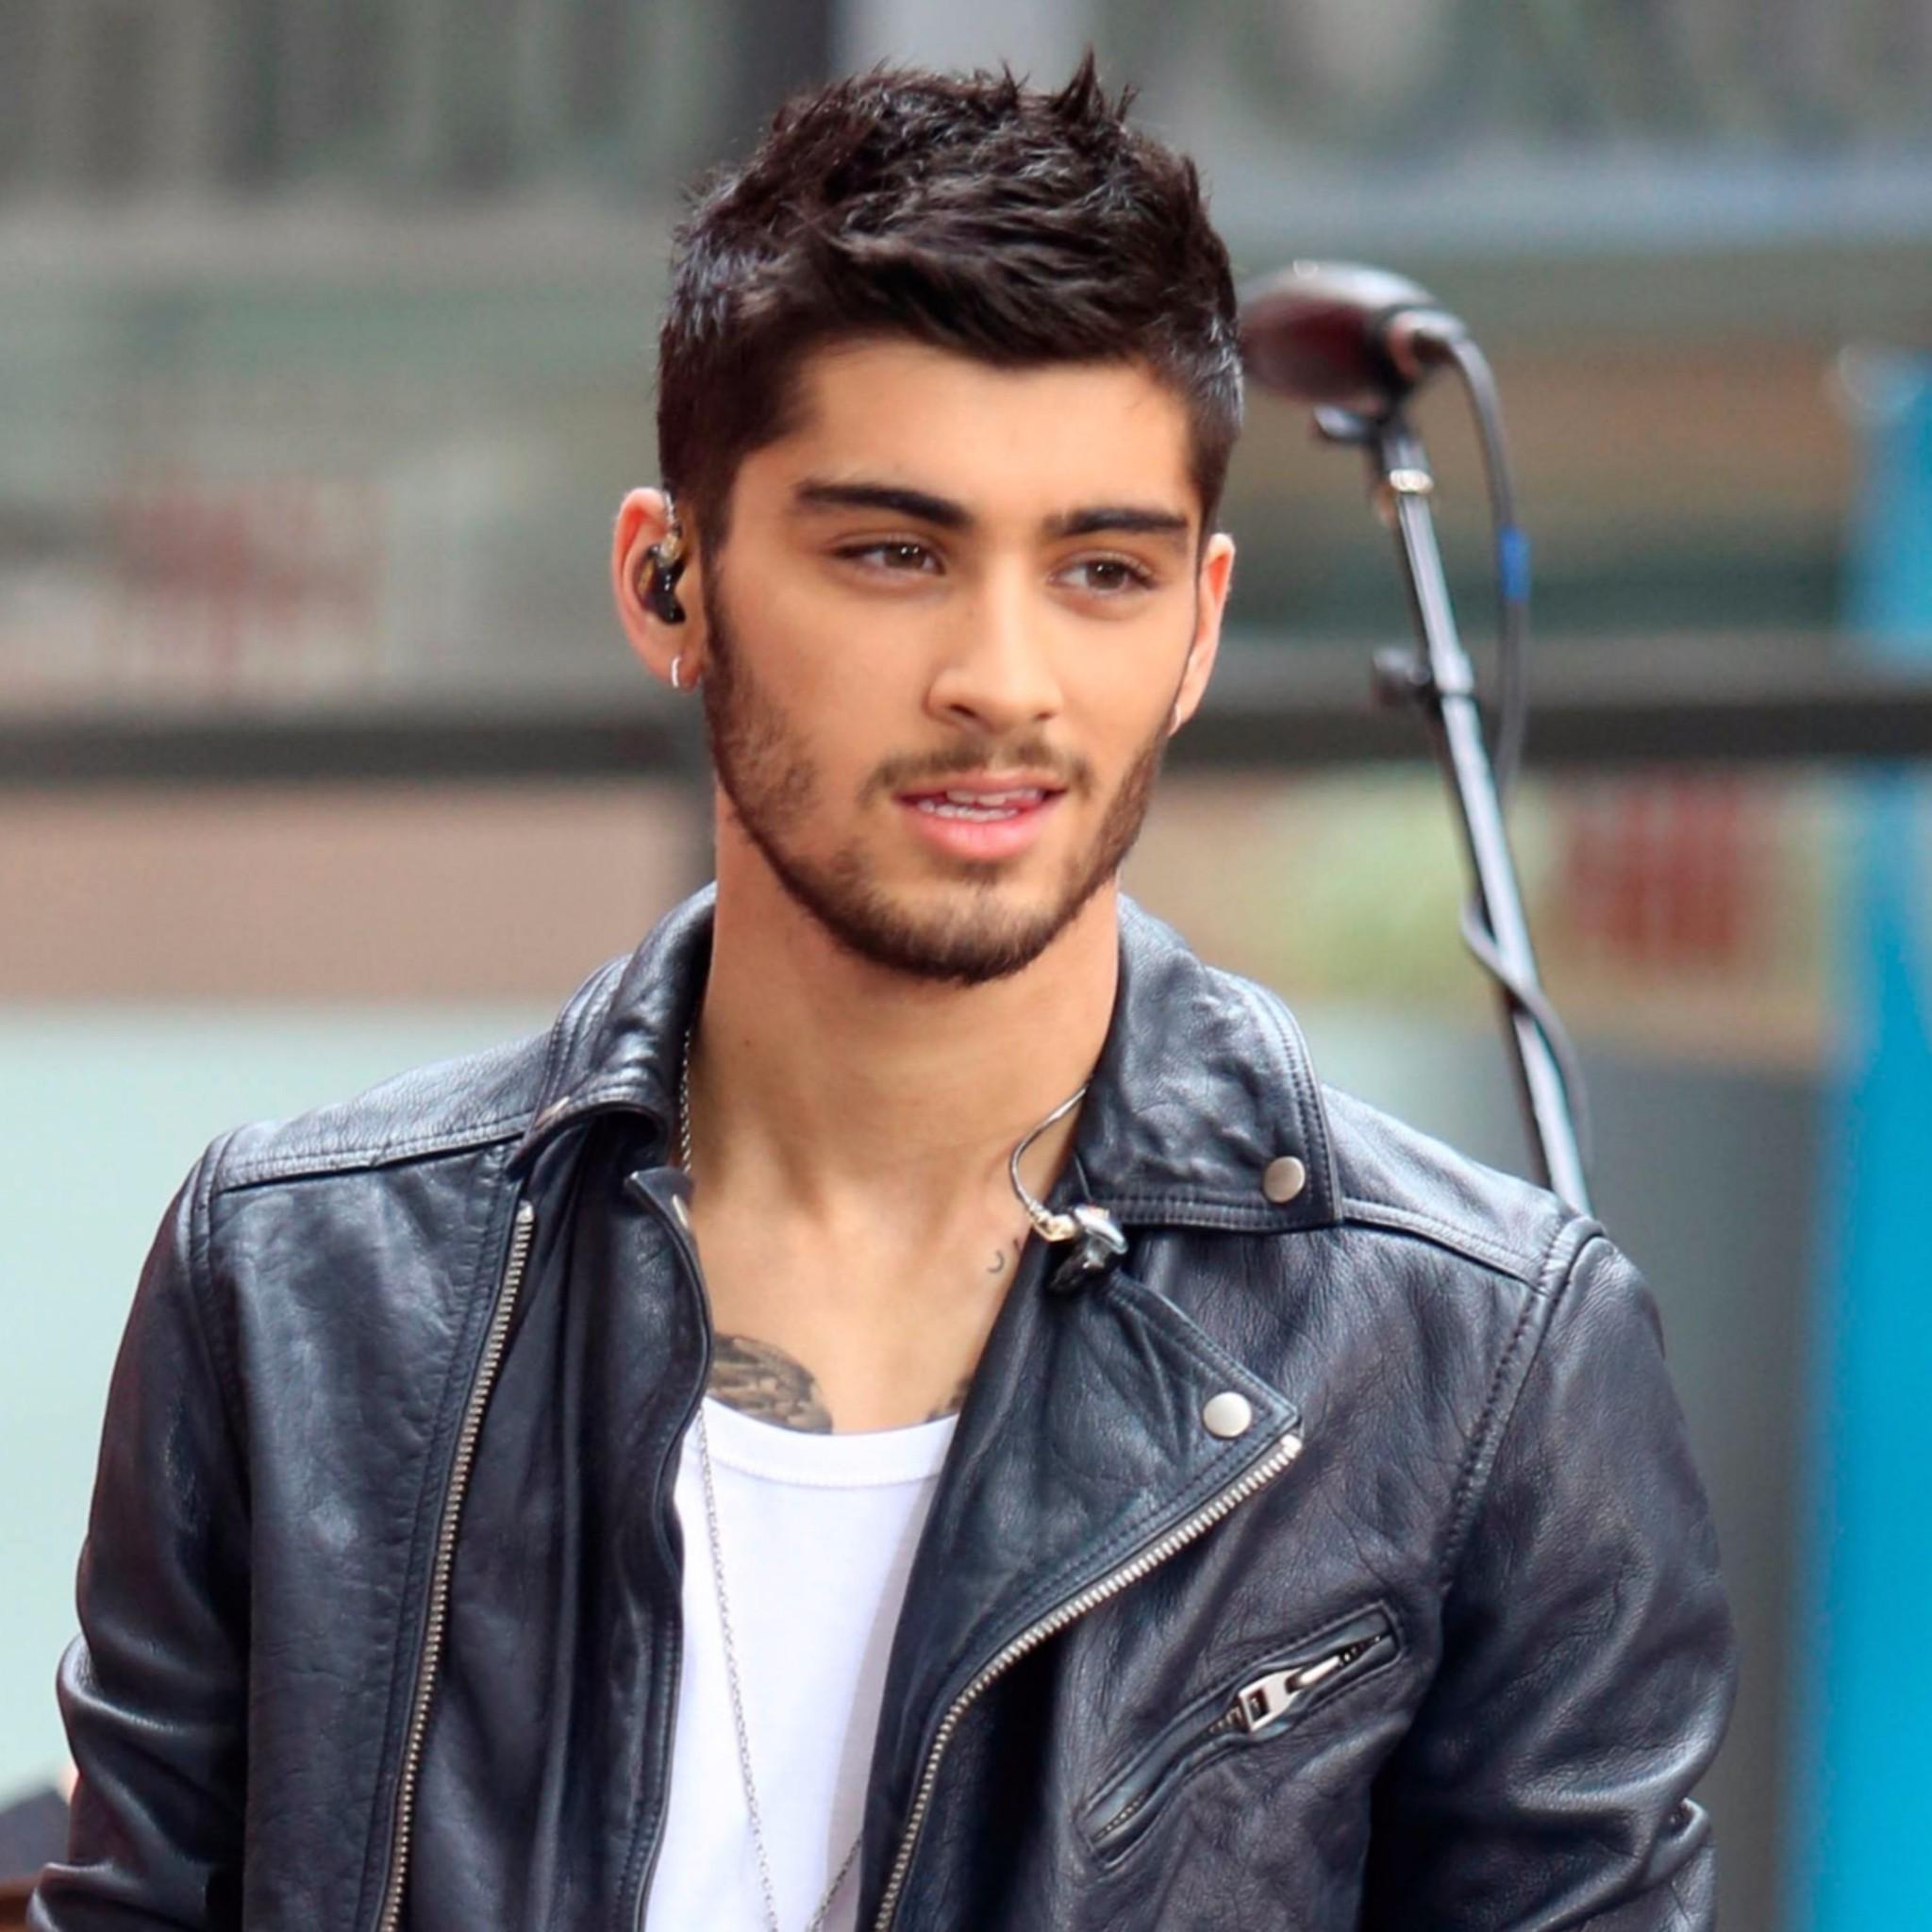 Related to One Direction Artist 2016 Zayn Malik 4K Wallpaper